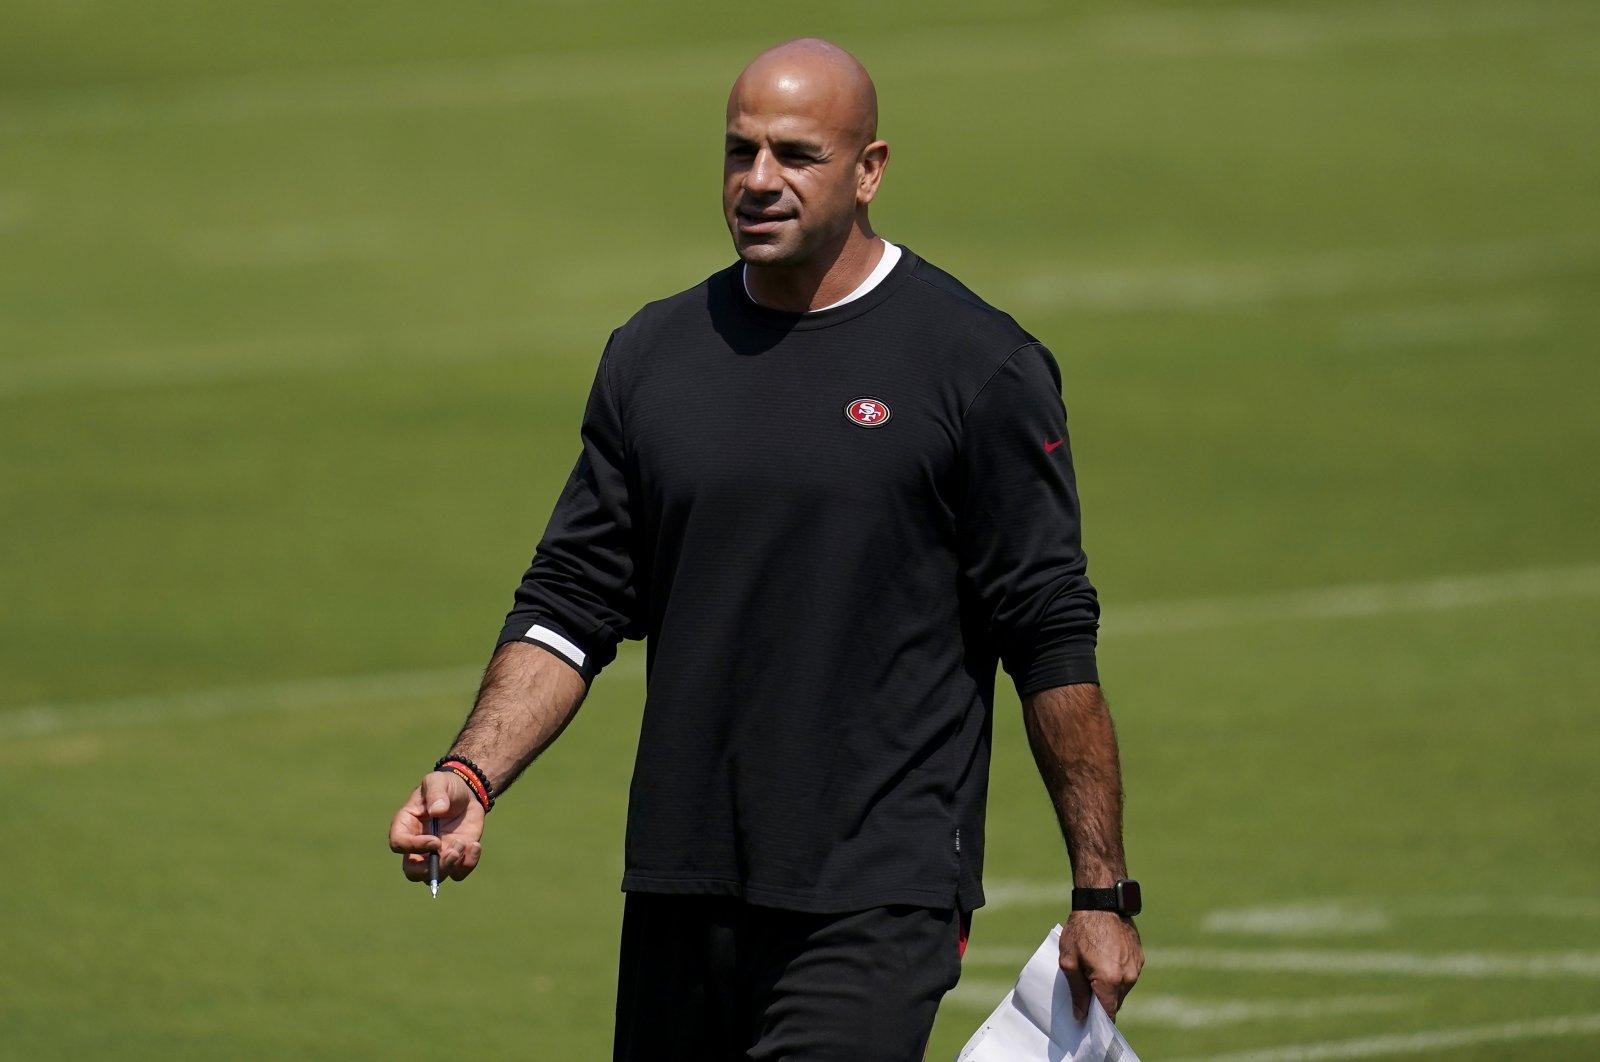 San Francisco 49ers defensive coordinator Robert Saleh watches during the NFL football team's practice in Santa Clara, California, Sept. 2, 2020. (AP Photo)